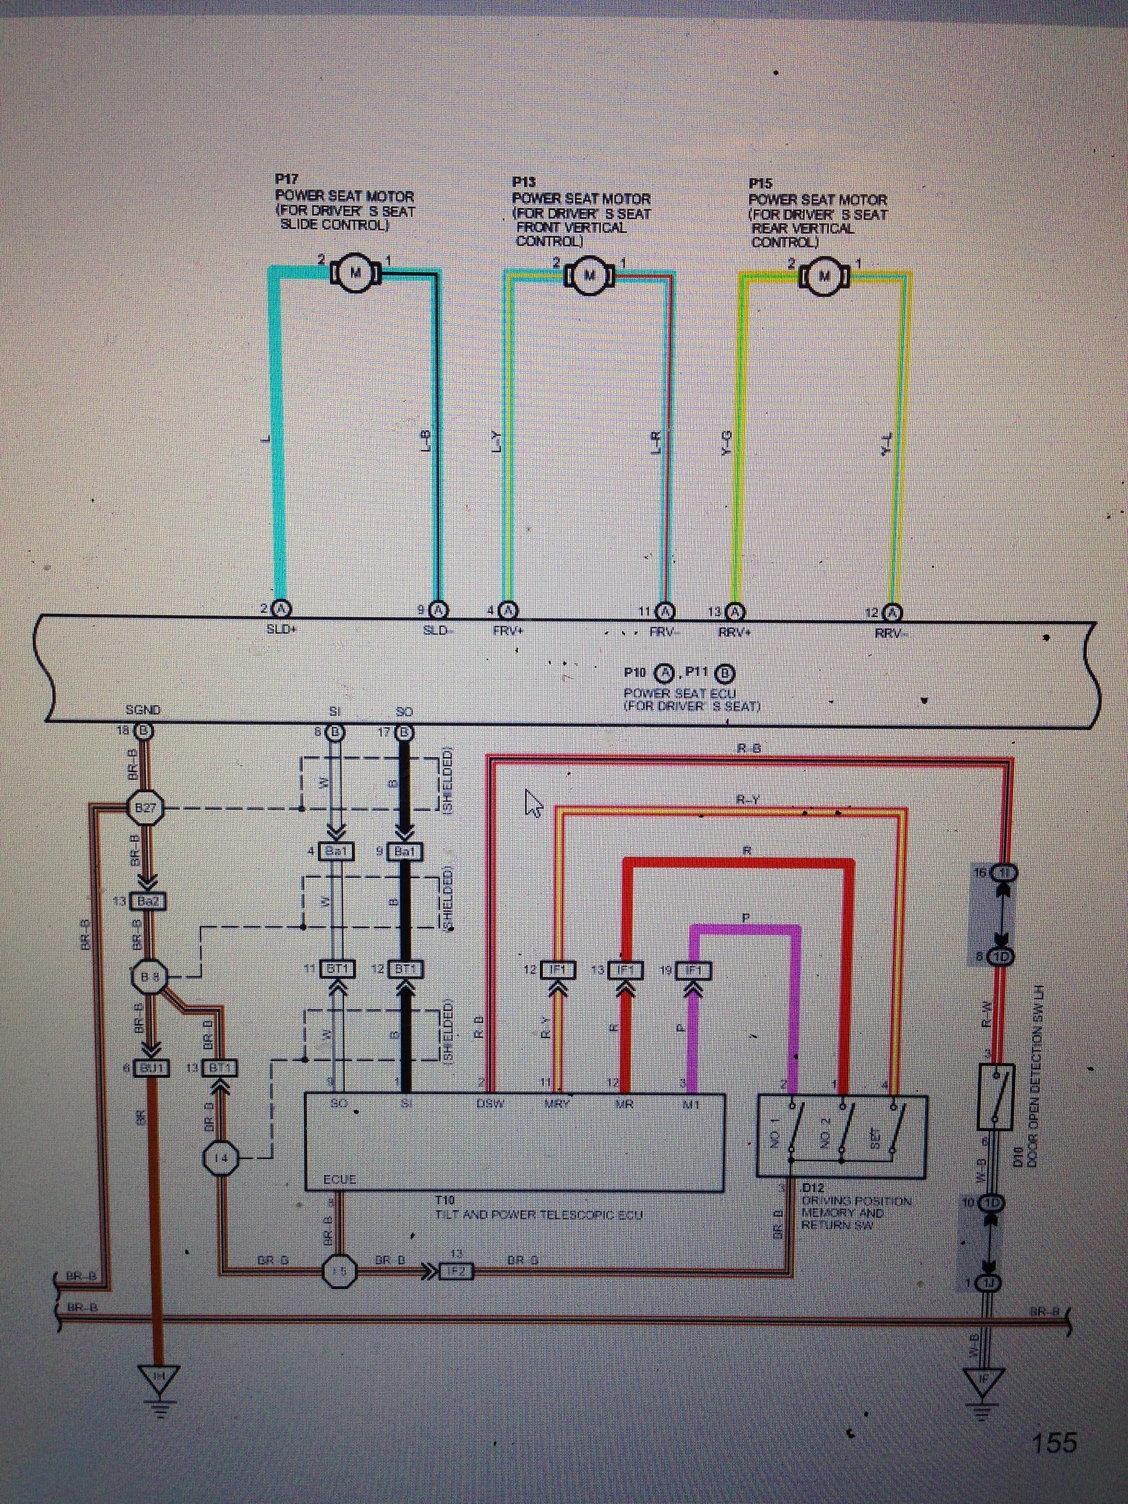 ✦DIAGRAM BASED✦ Power Seat Wiring Diagram 92 Lexus Sc 300 COMPLETED DIAGRAM  BASE Sc 300 -  JEFFREY.LANG.KENNETH.G.SHIPLEY.3WAYSWITCHWIRINGDIAGRAM.PCINFORMI.ITDiagram Based Completed Edition - Pcinformi.it